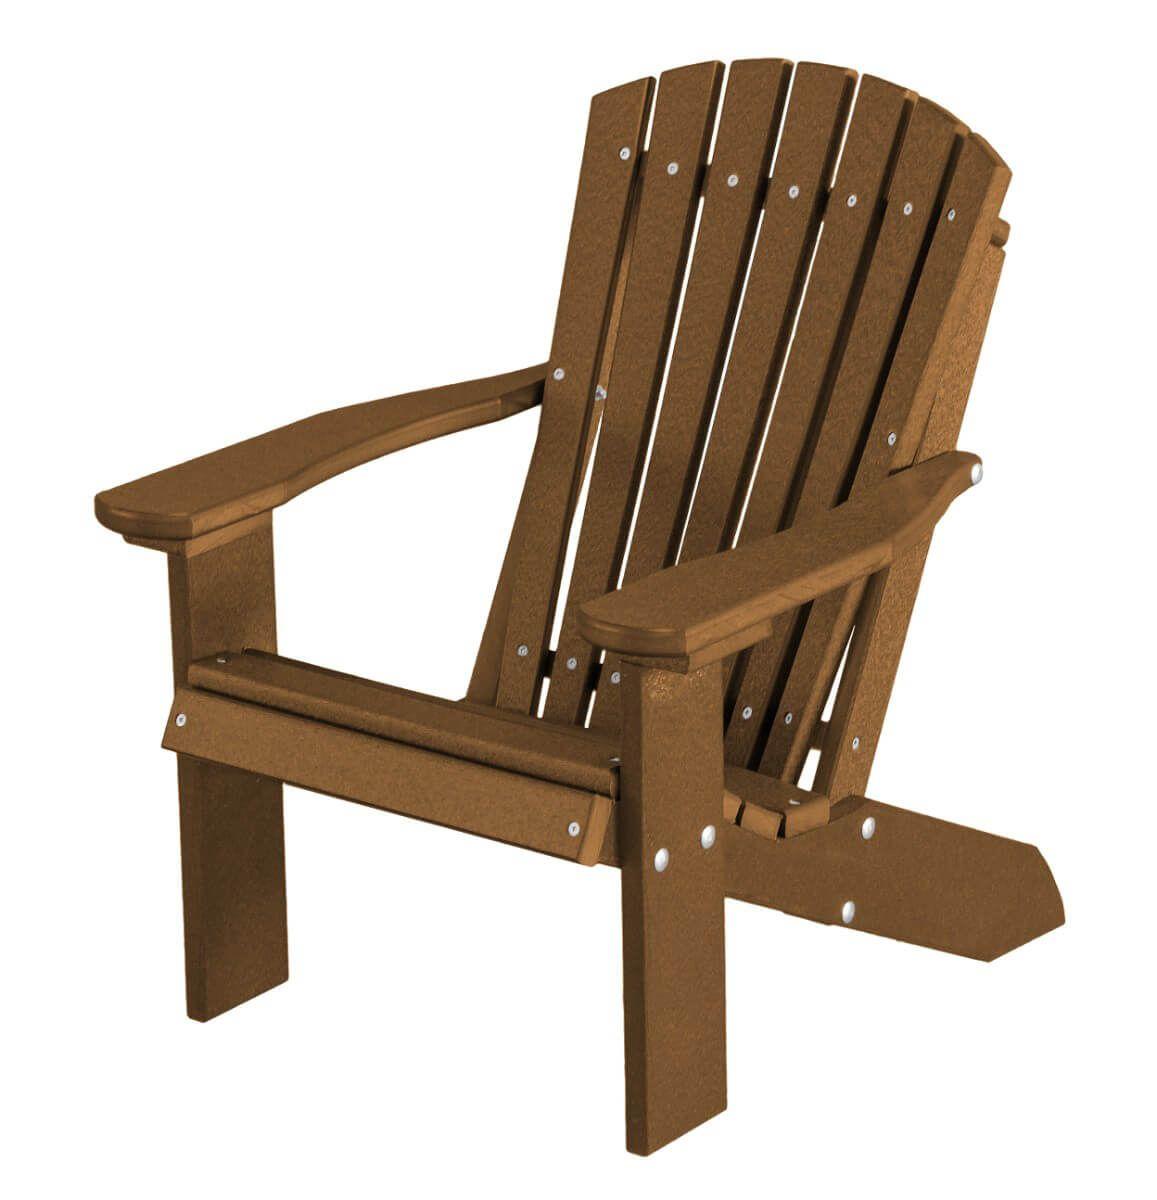 Tudor Brown Sidra Child's Adirondack Chair